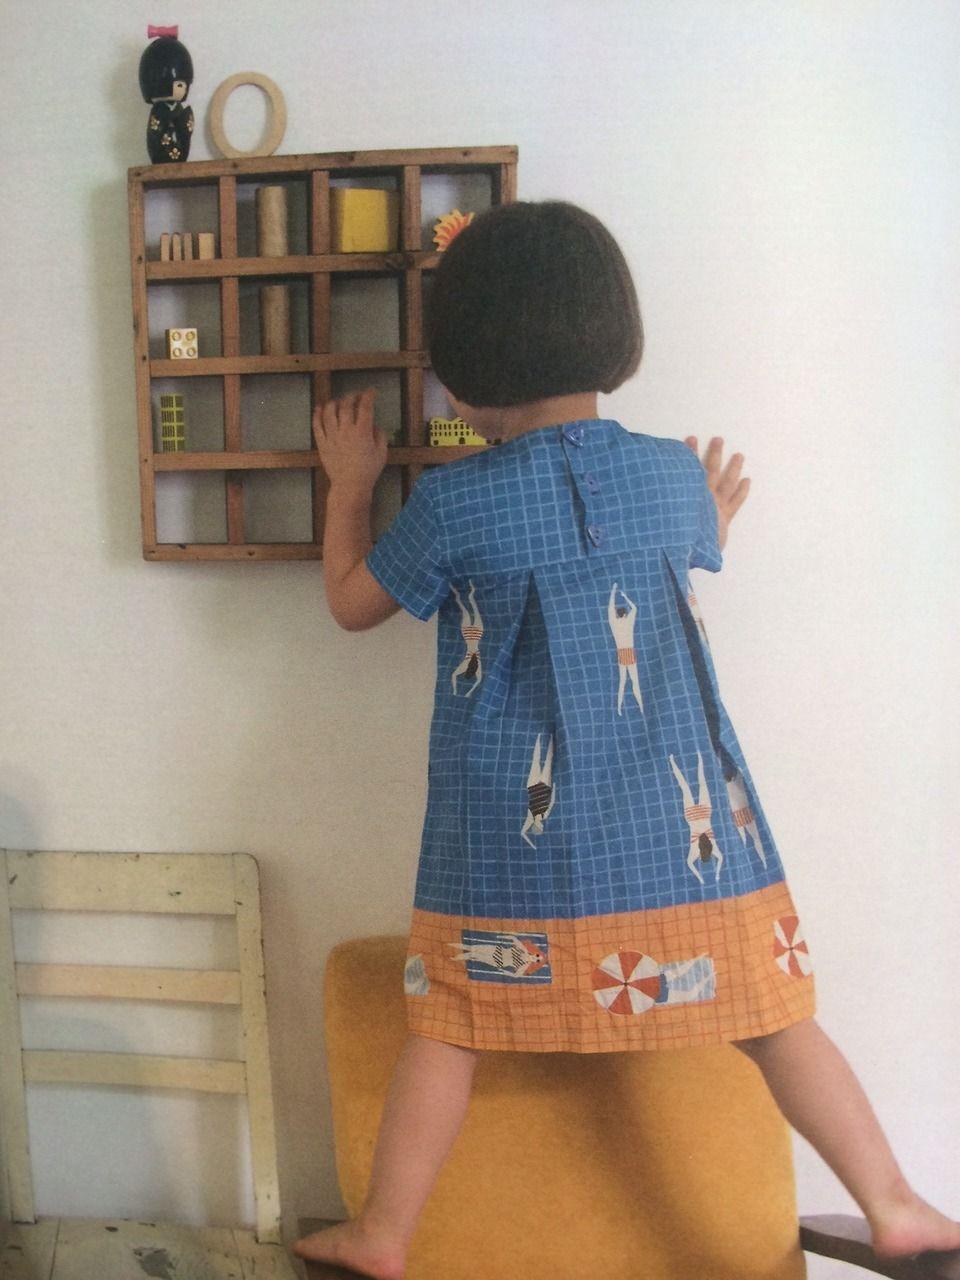 Naomi Wilkinson dress for Milk & Biscuits #kids #dress #pattern #fabrics #fabric #style #dress #beautiful #precioso #infantil #vestido #tela #estampado #niña #girl #drawing #swim #swimmer #nadador #dibujo #ilustración #illustration